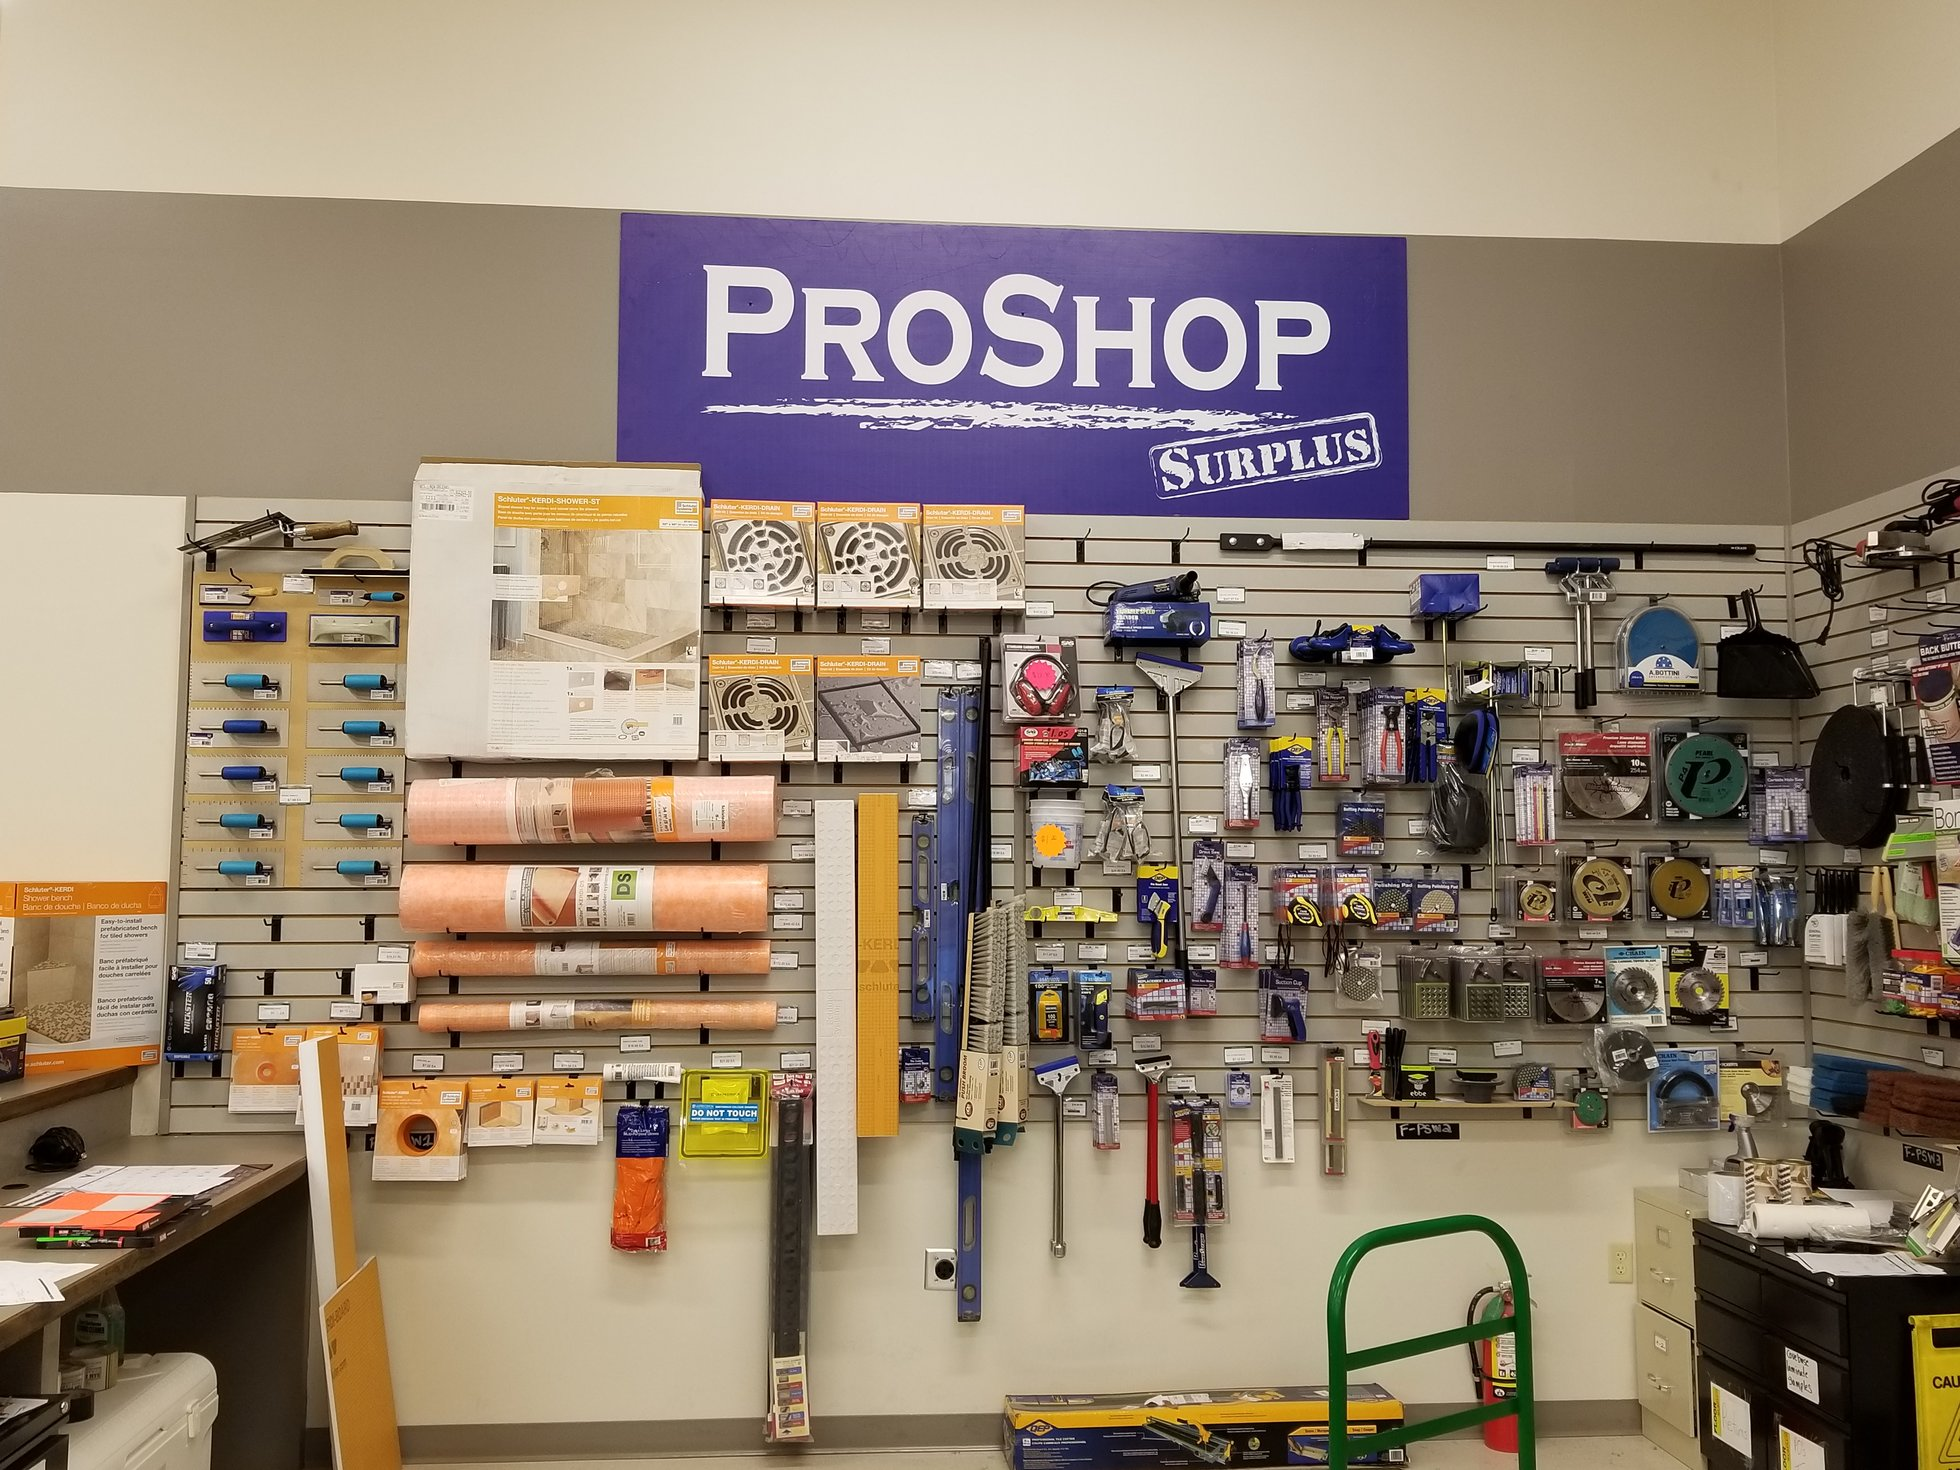 floor surplus proshop supplies